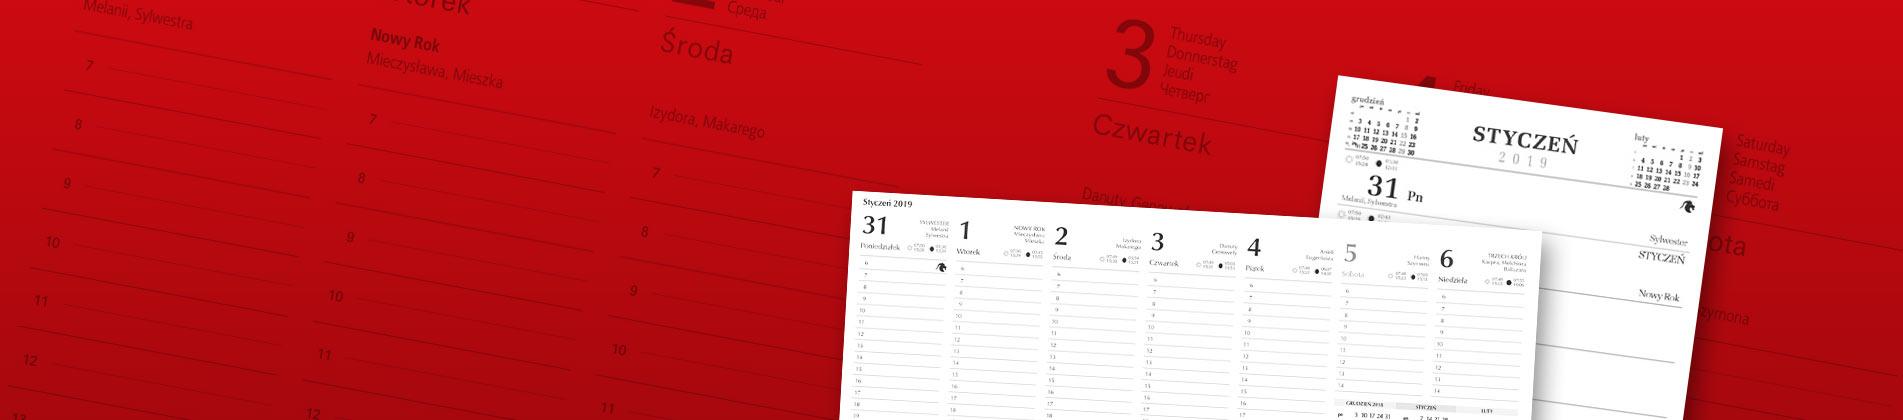 Kalendarze biurkowe | piramidki, biuwary